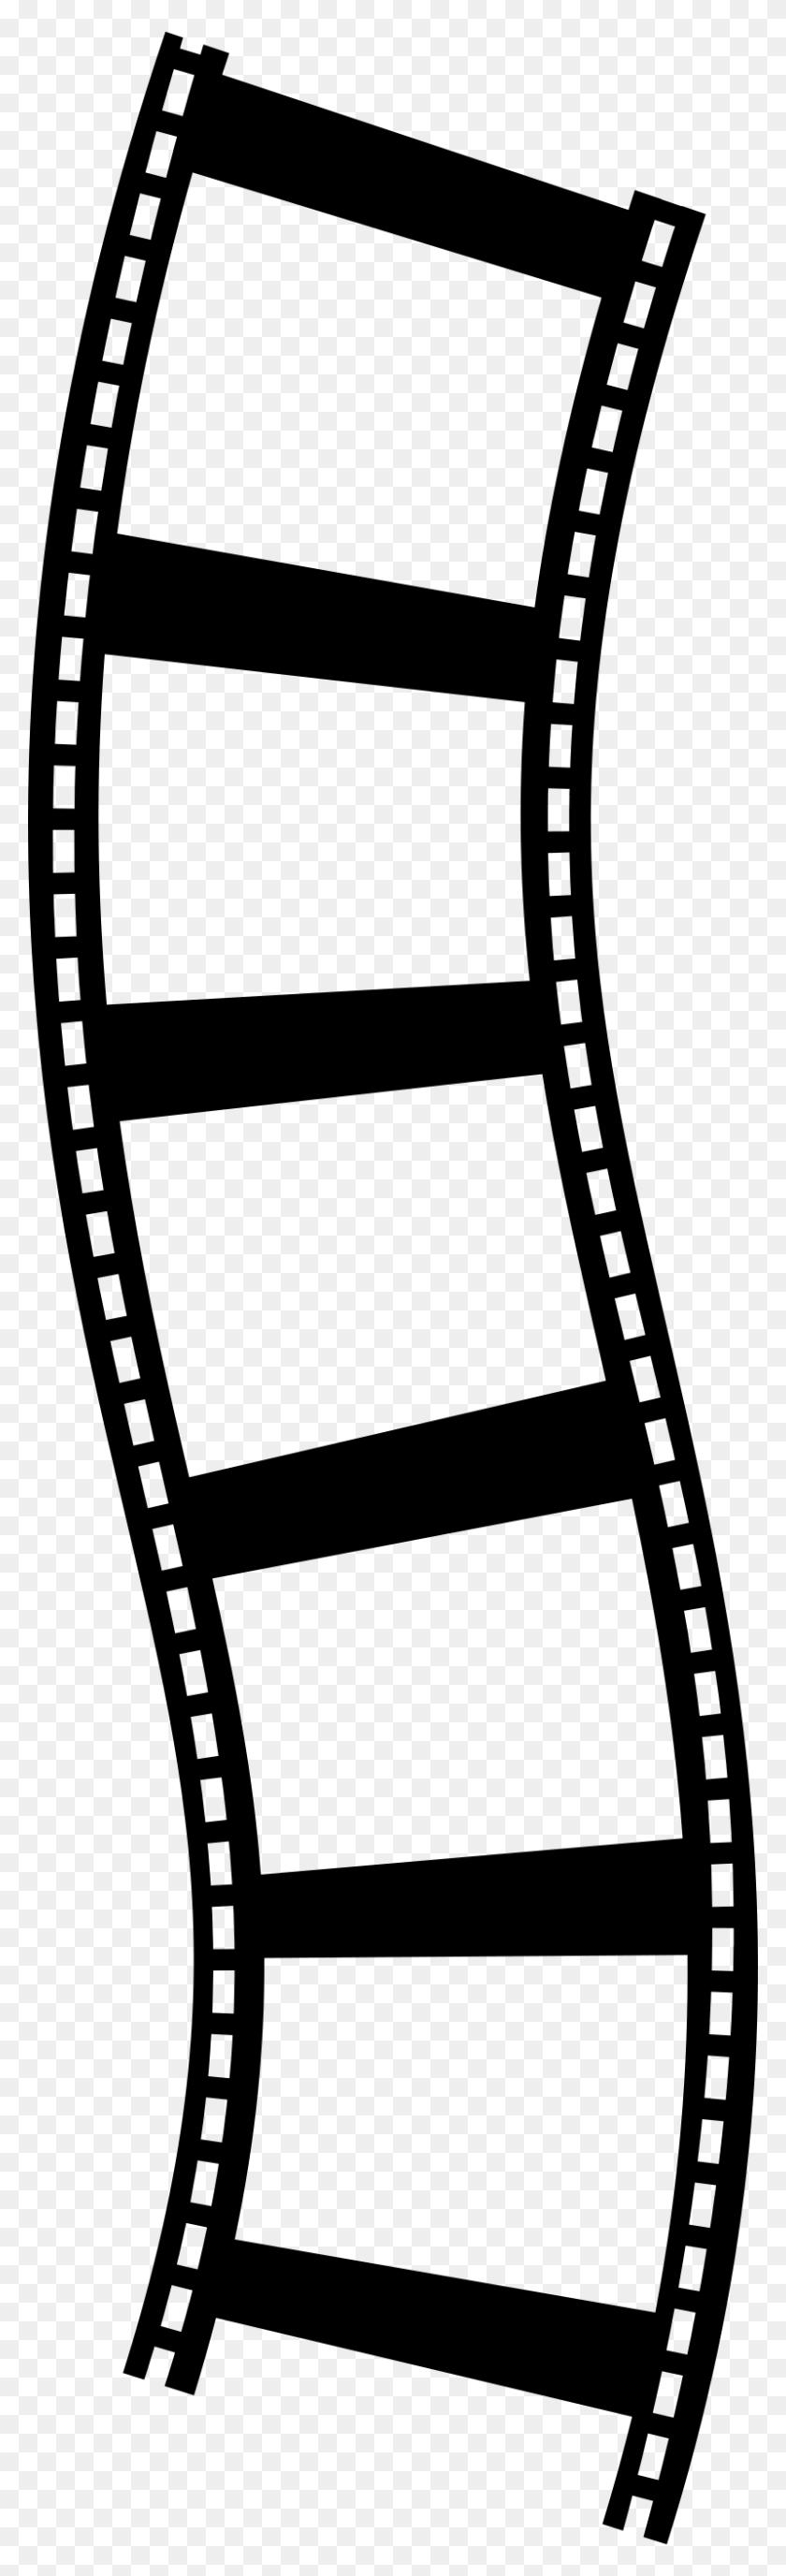 Movie Clapper Clipart Free Download Movie Clipart - Movie Clapper Clipart